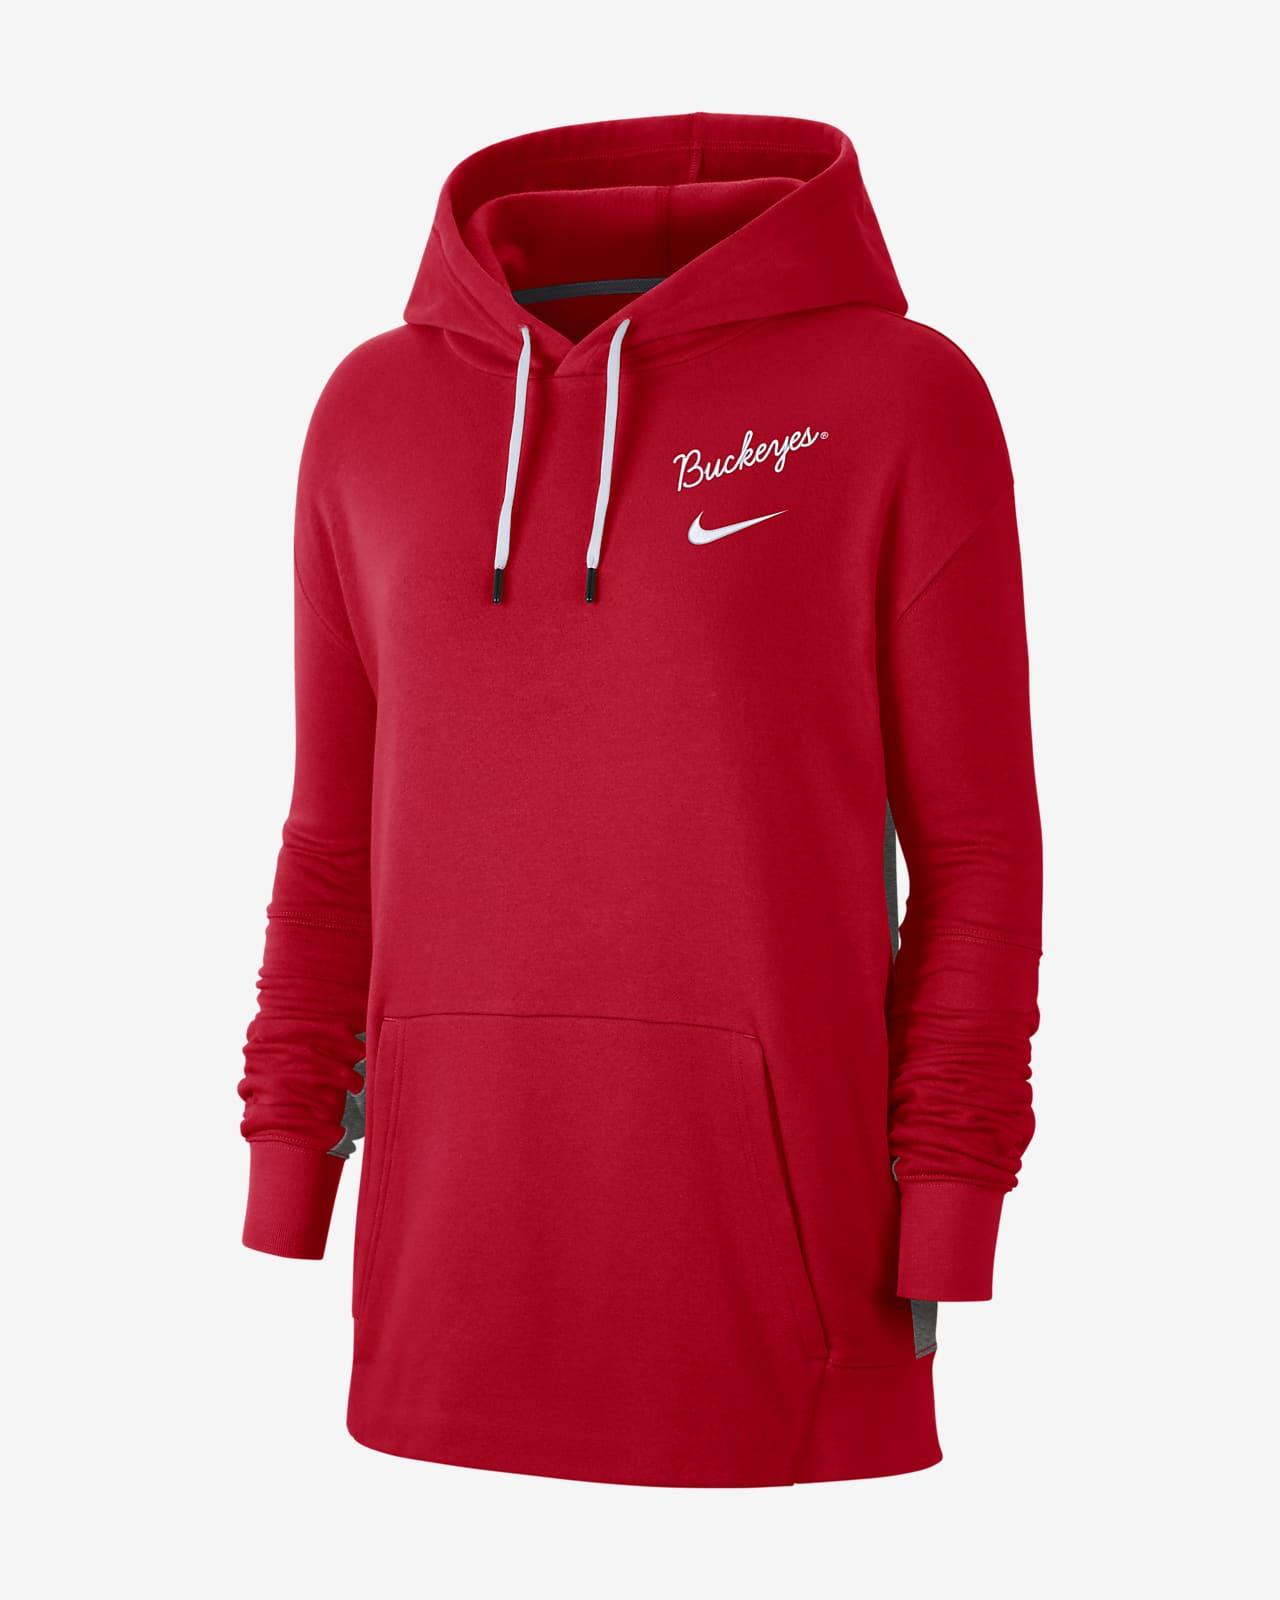 Nike College (Ohio State) Women's Fleece Pullover Hoodie